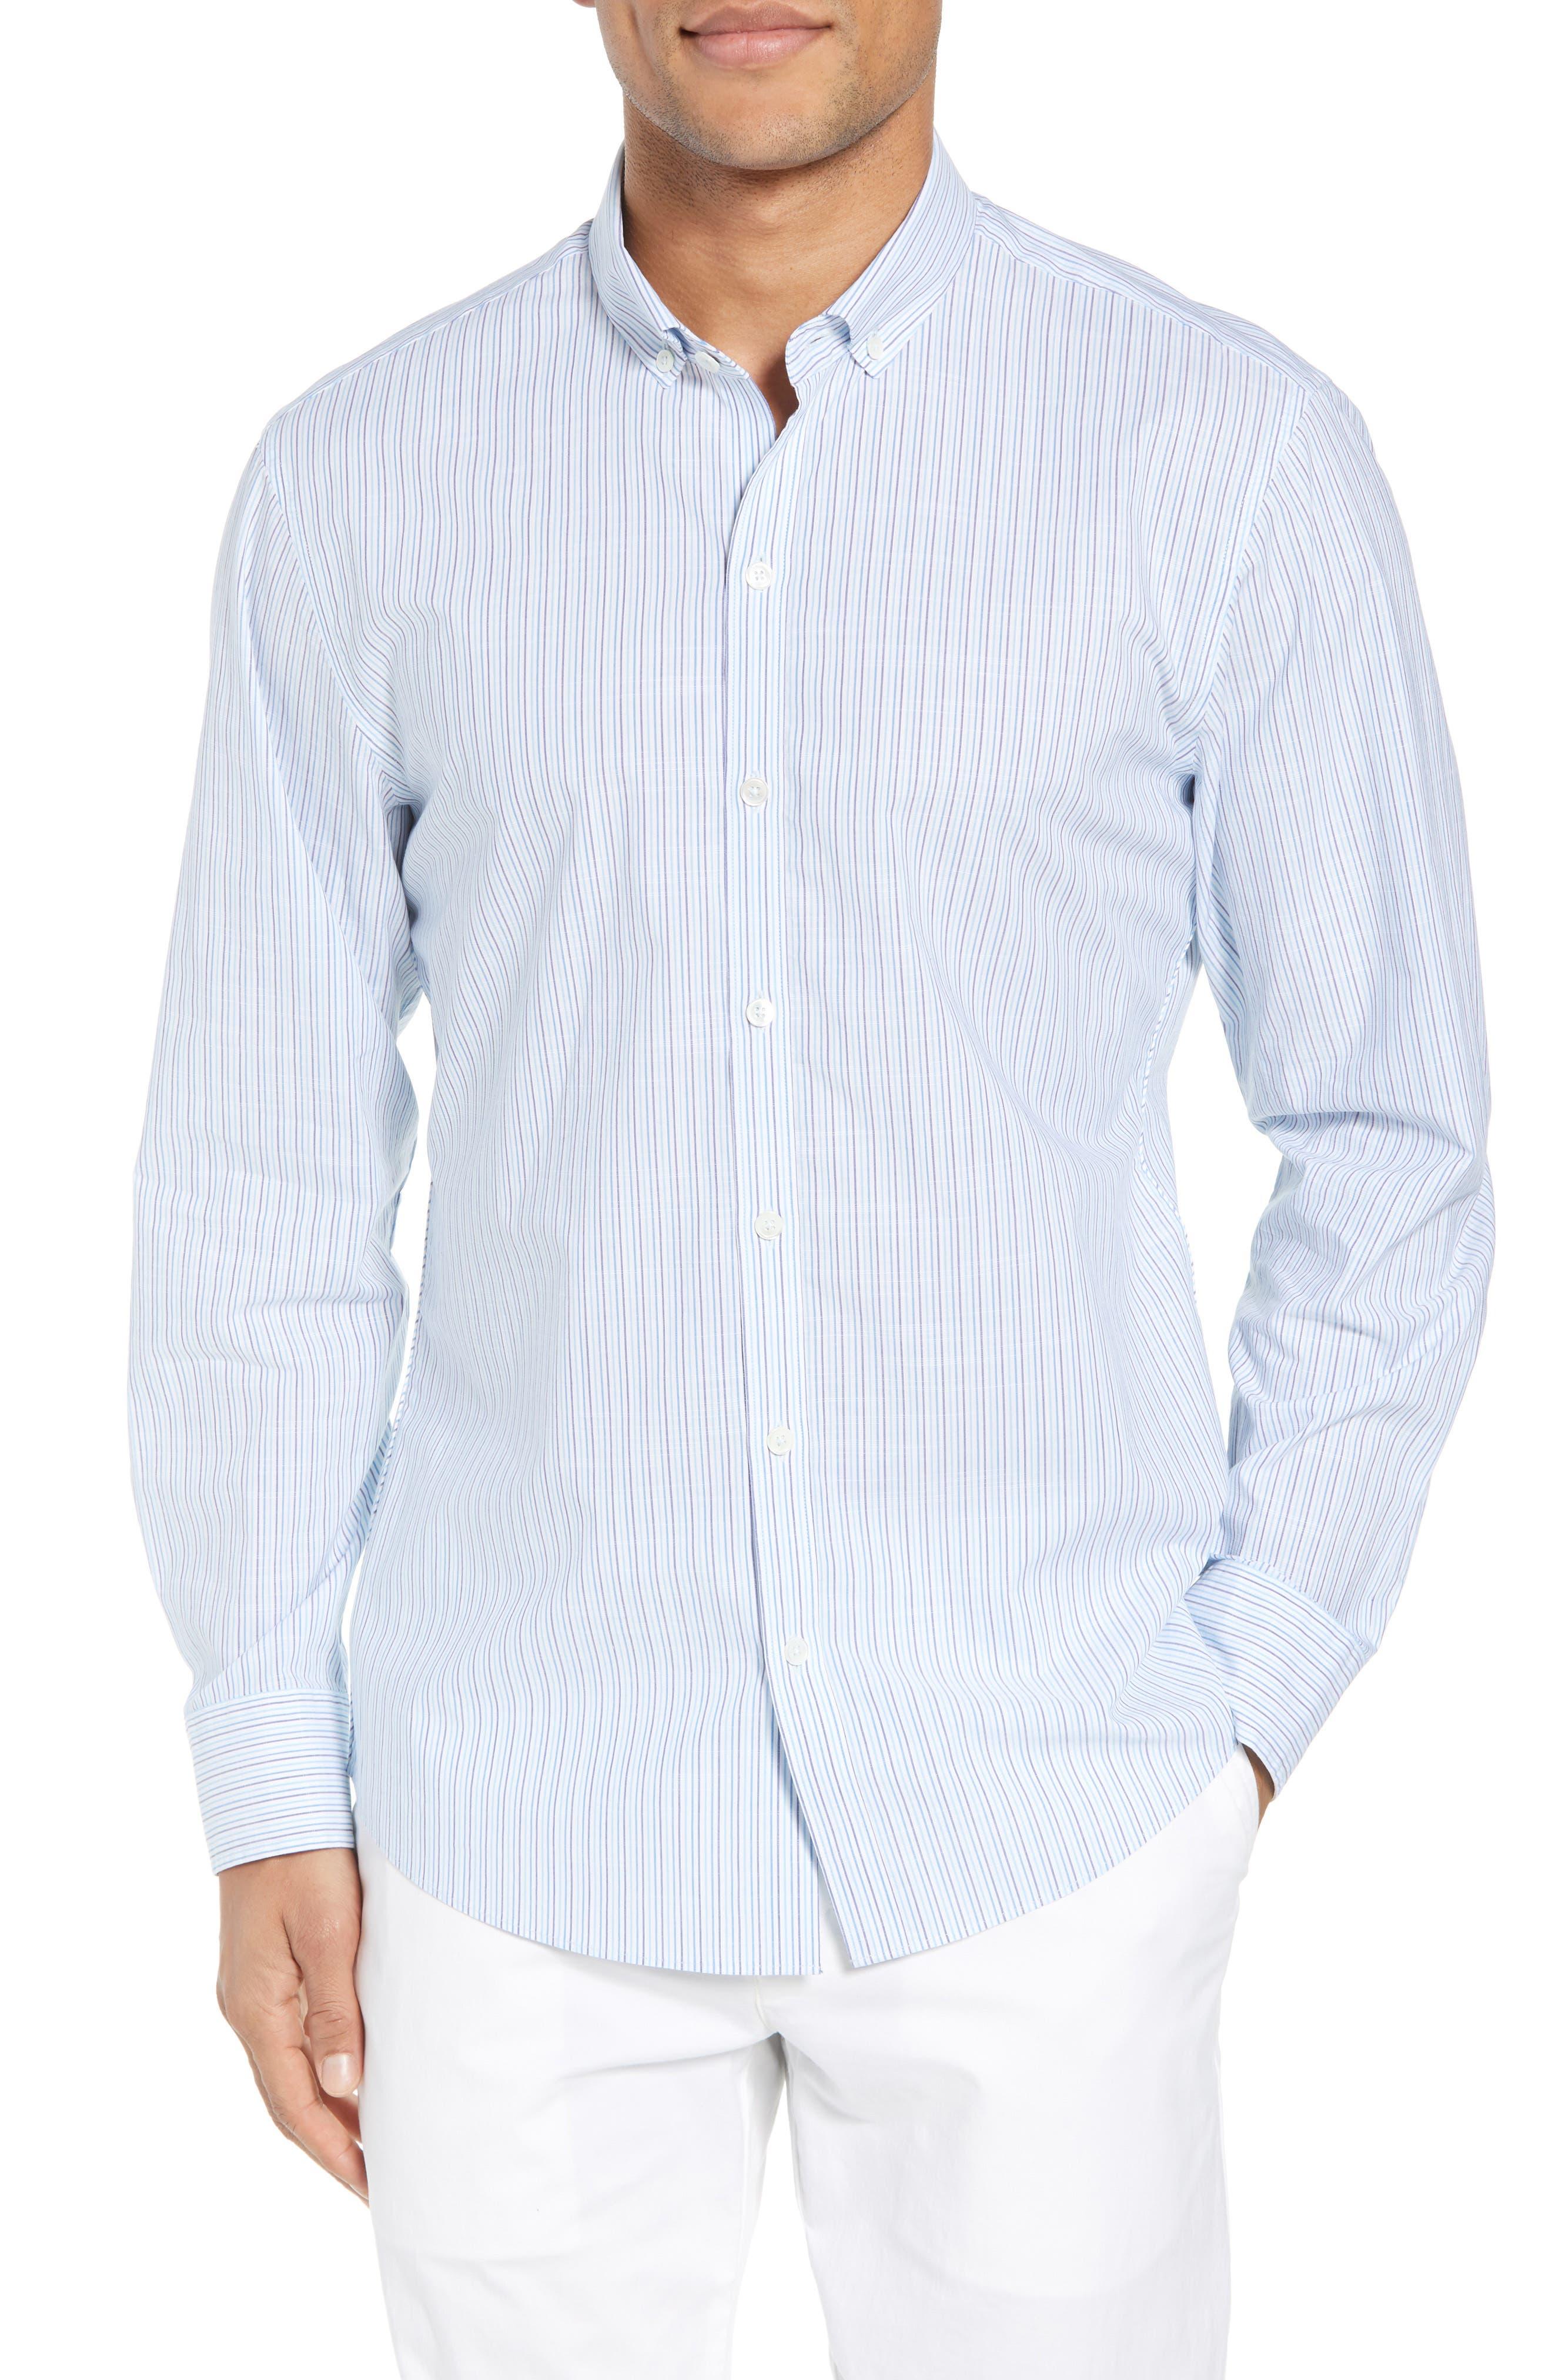 Skeeter Stripe Sport Shirt,                             Main thumbnail 1, color,                             440